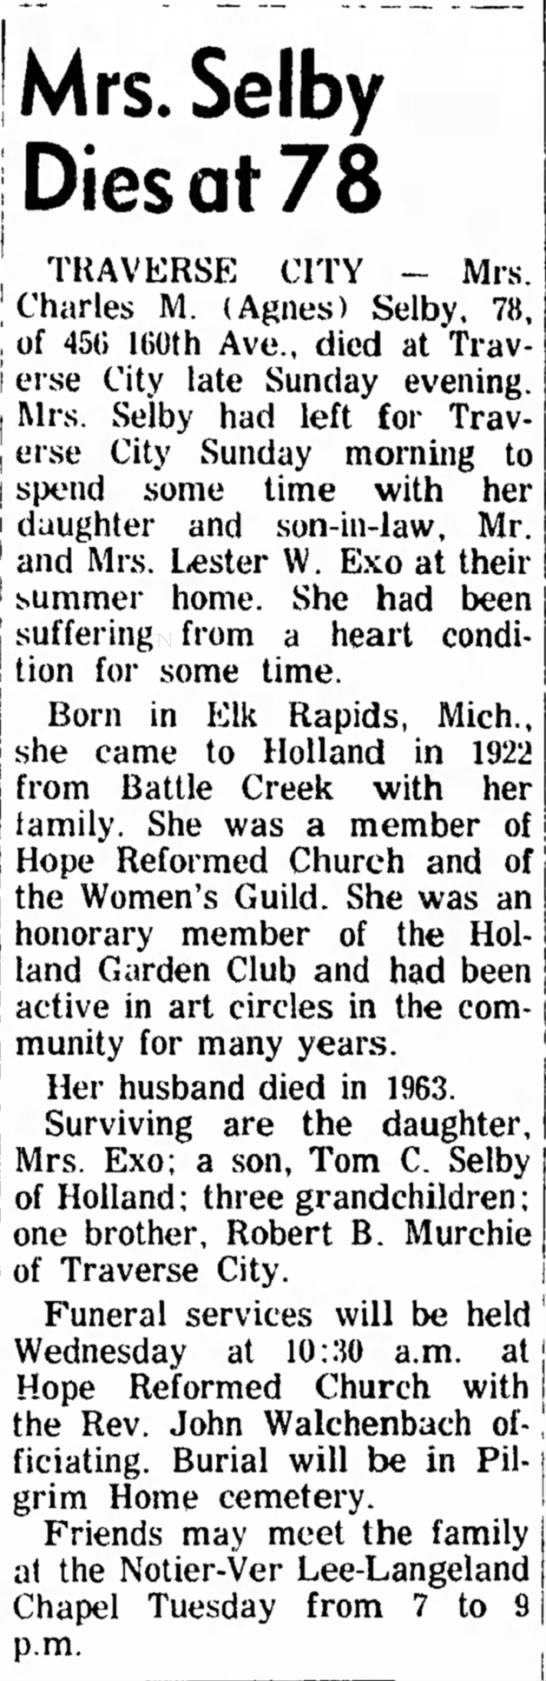 Agnes E (Murchie) Selby 28 Jun 1965 pg 6 Monday - j He | I ' I l l ! J 9. j Mrs. Selby Dies at 78...